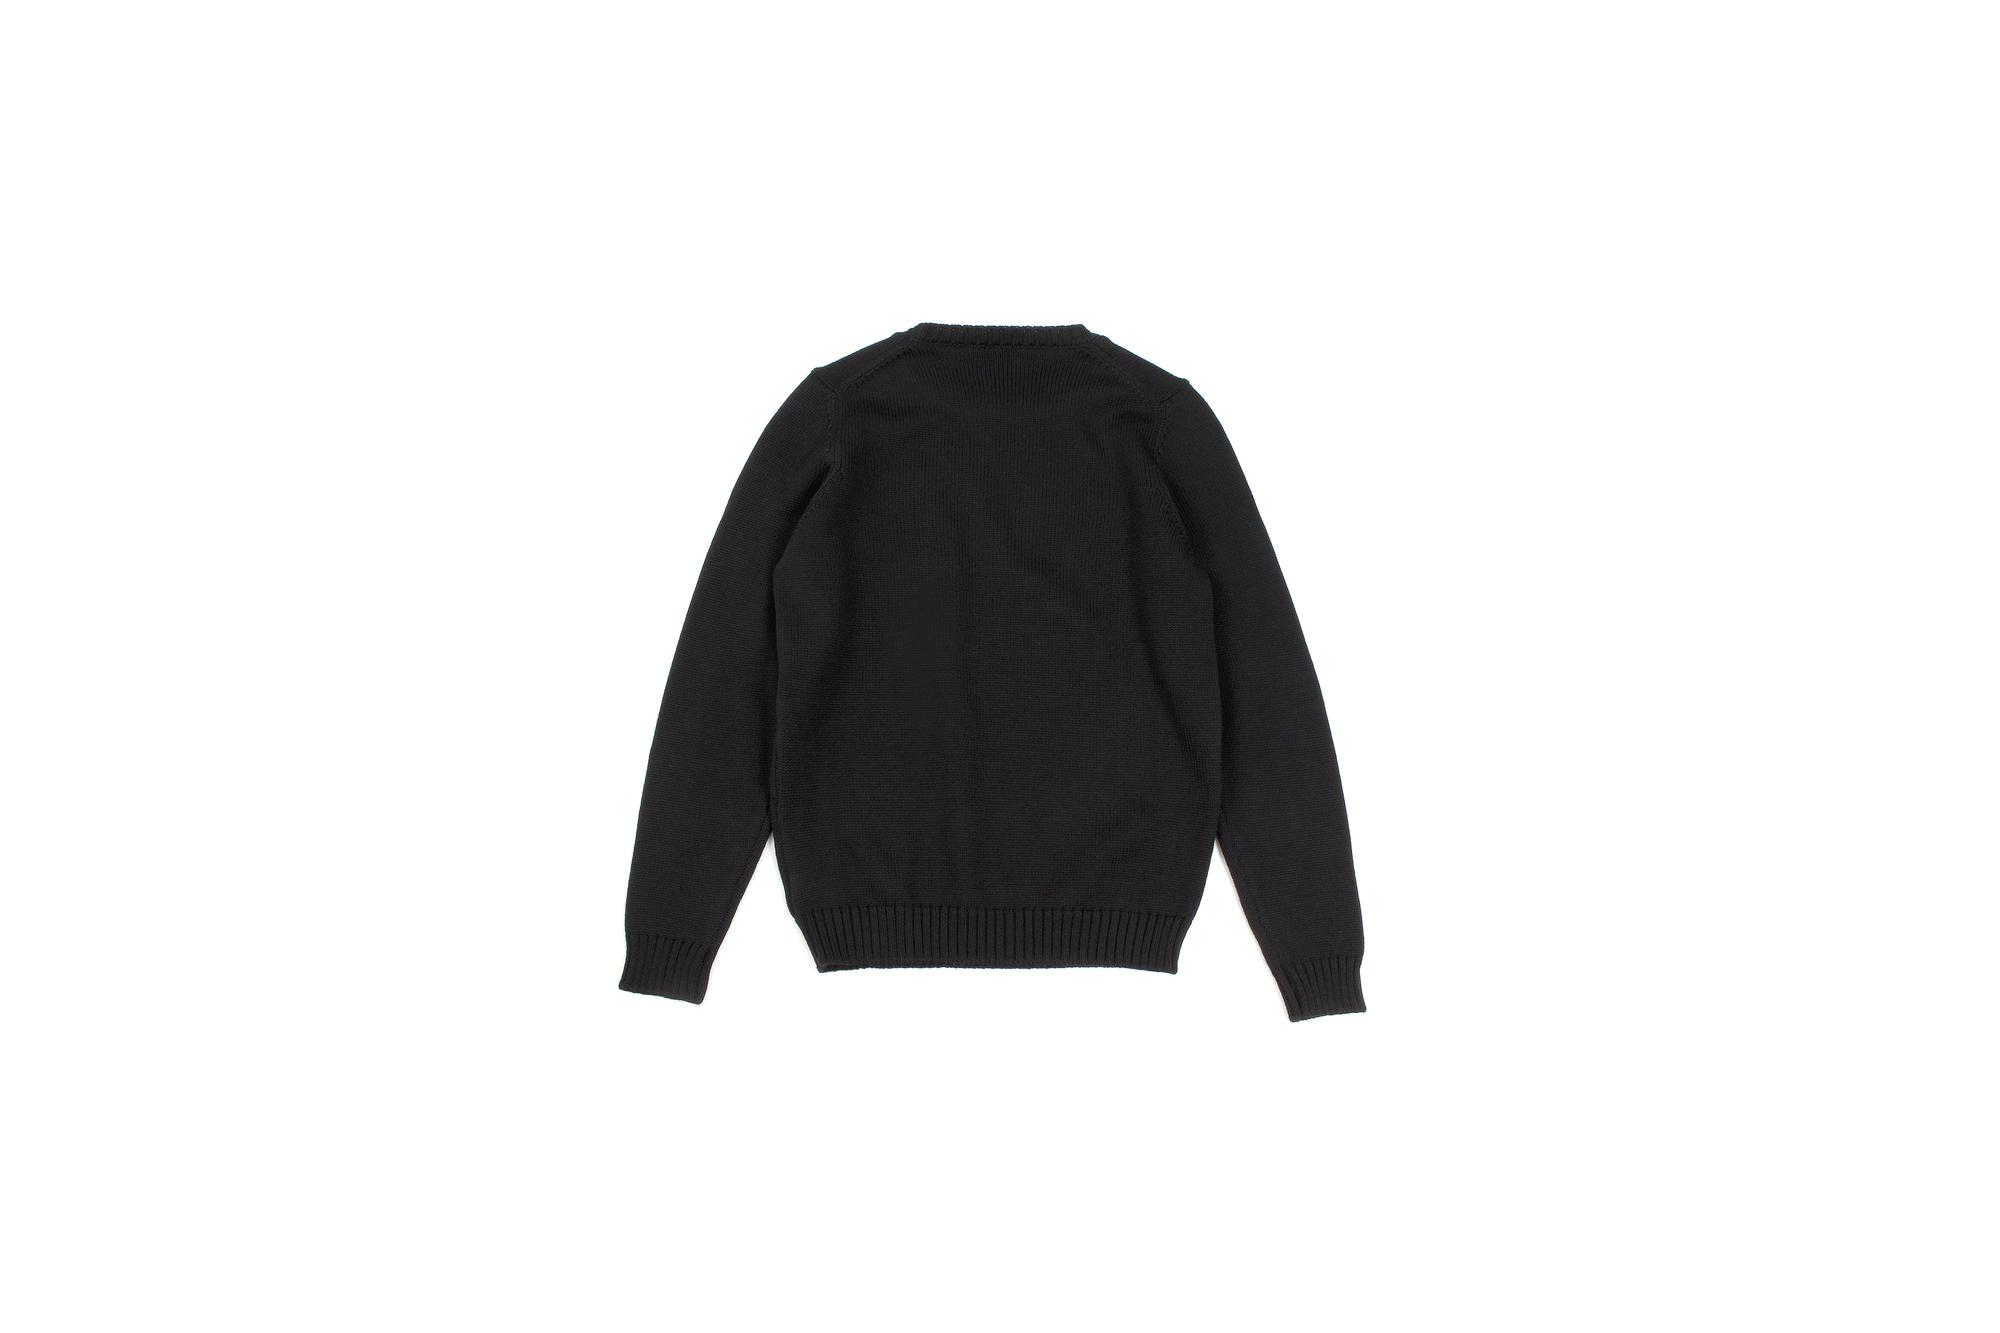 ZANONE(ザノーネ) Crew Neck Sweater (クルーネック セーター) VIRGIN WOOL 100% ミドルゲージ ウールニット セーター BLACK (ブラック・Z0015) made in italy (イタリア製) 2020 秋冬 【ご予約受付中】愛知 名古屋 altoediritto アルトエデリット タートル